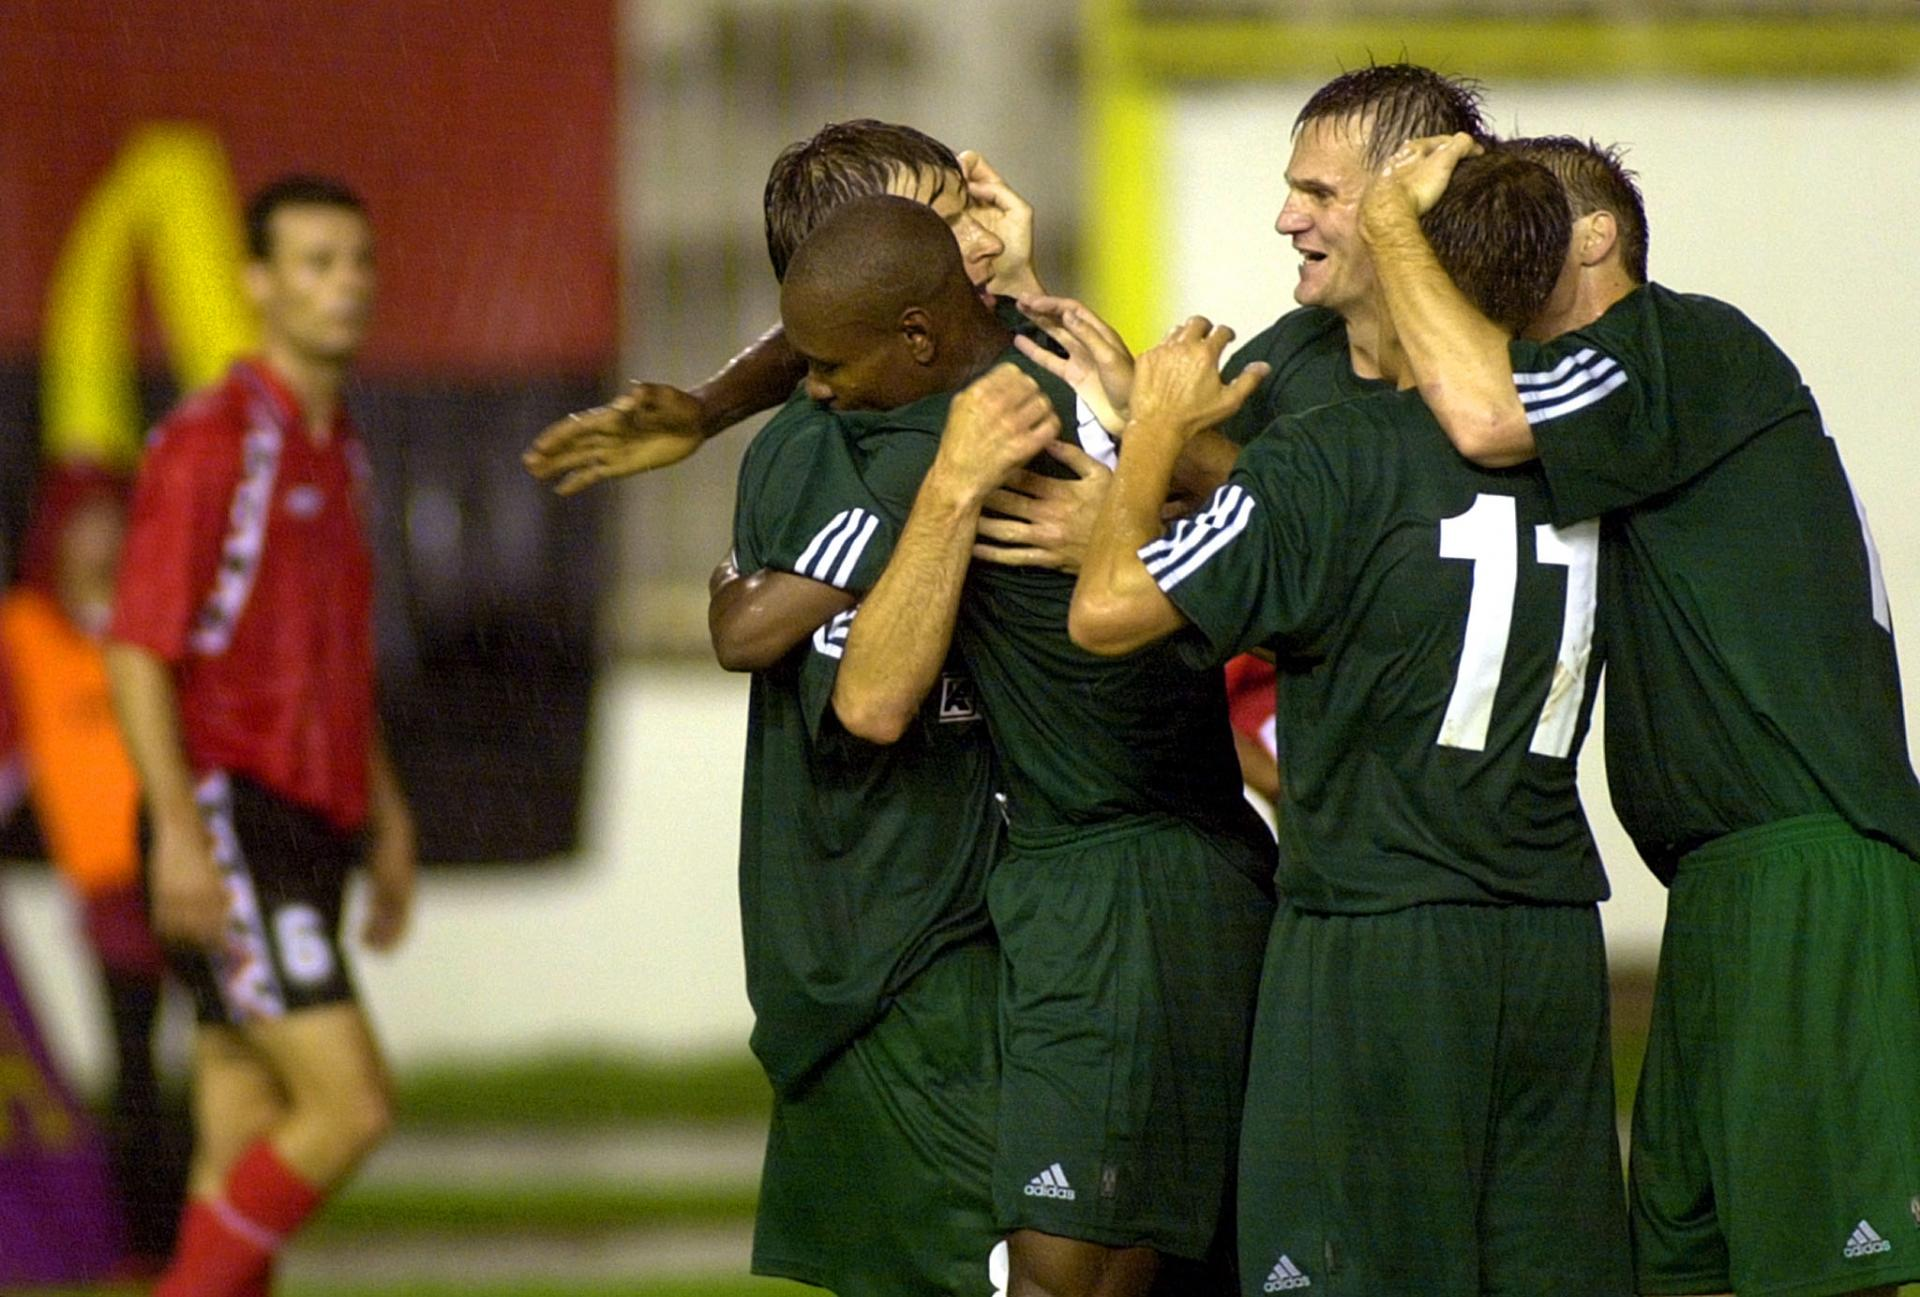 Vardar Skopje – Legia Warszawa 1:3 (31.07.2002)